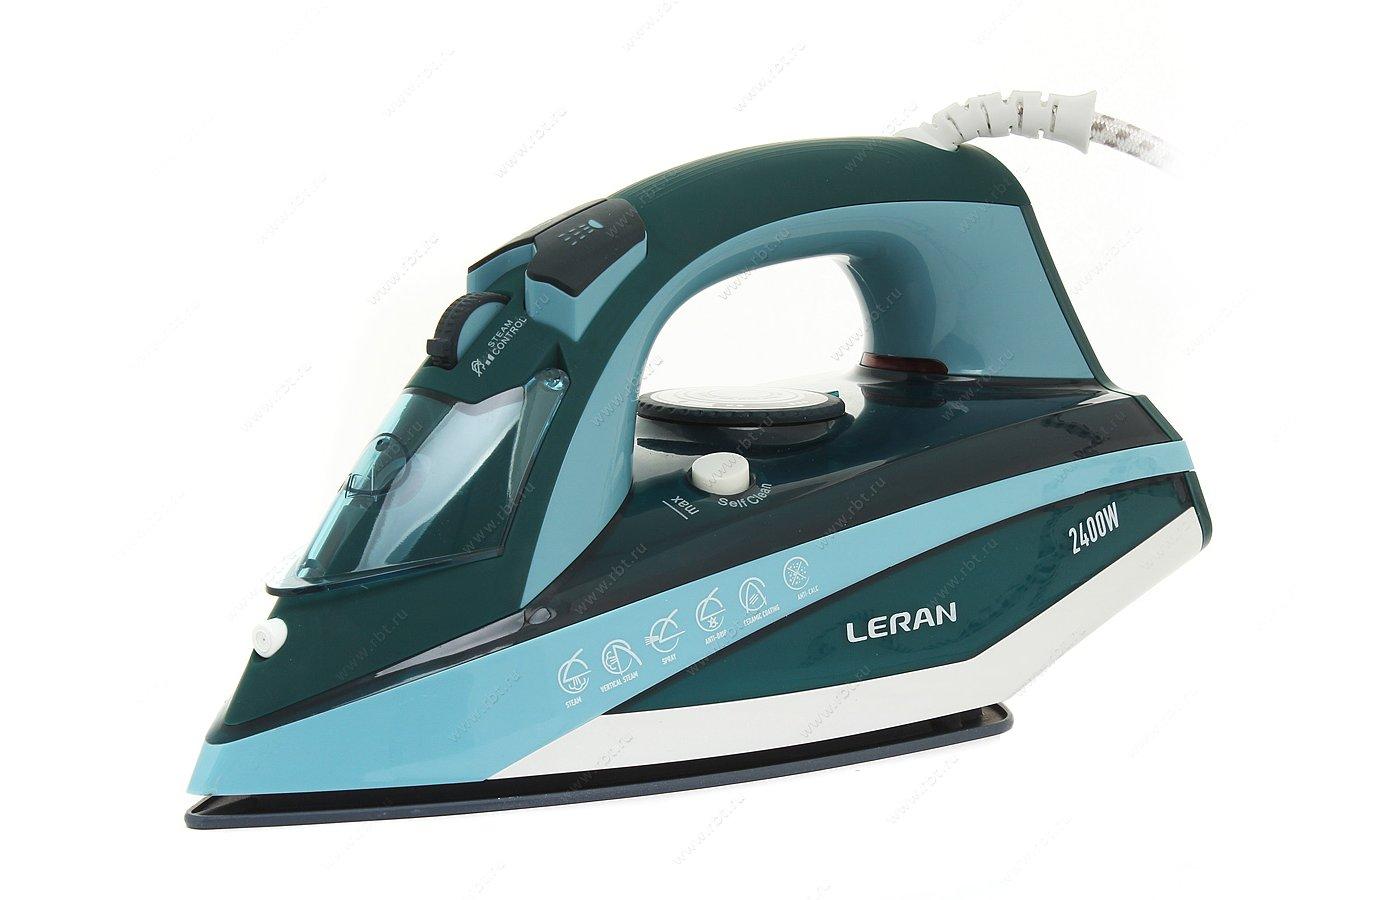 Утюг LERAN CEI 2466 GB